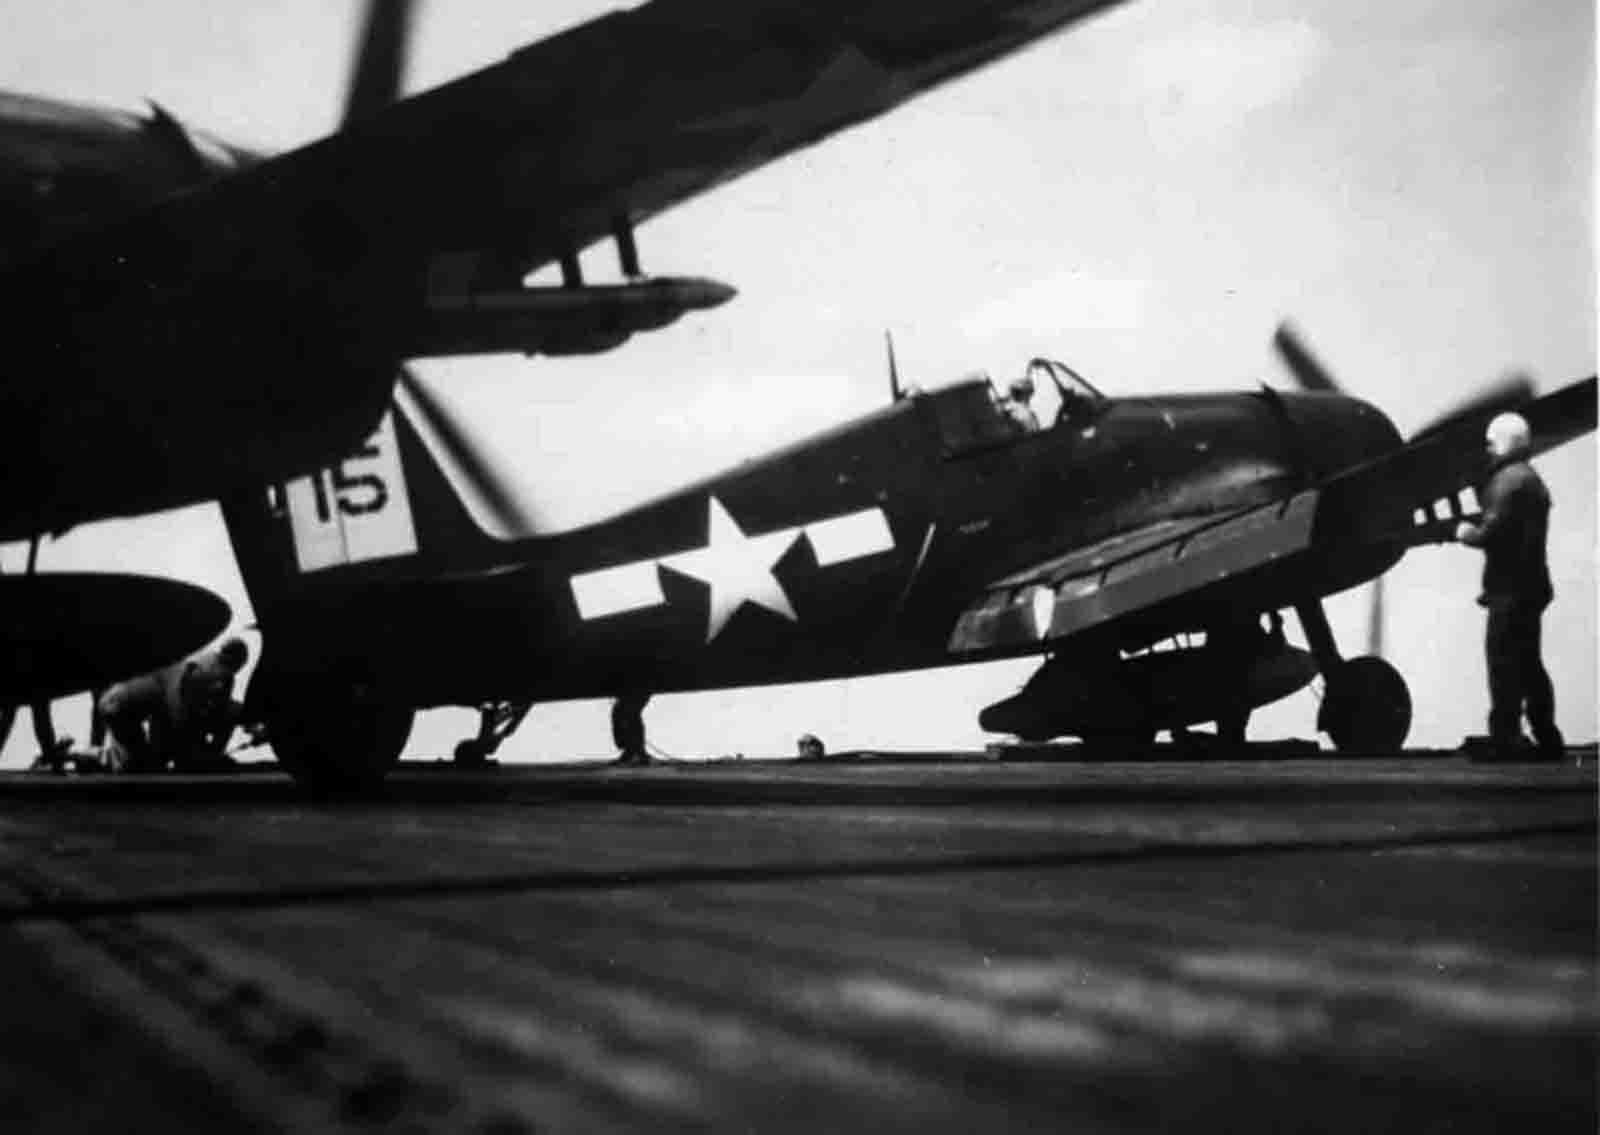 Grumman F6F 5 Hellcat VF 45 White 15 aboard CVL 30 USS San Jacinto Mar 1945 01